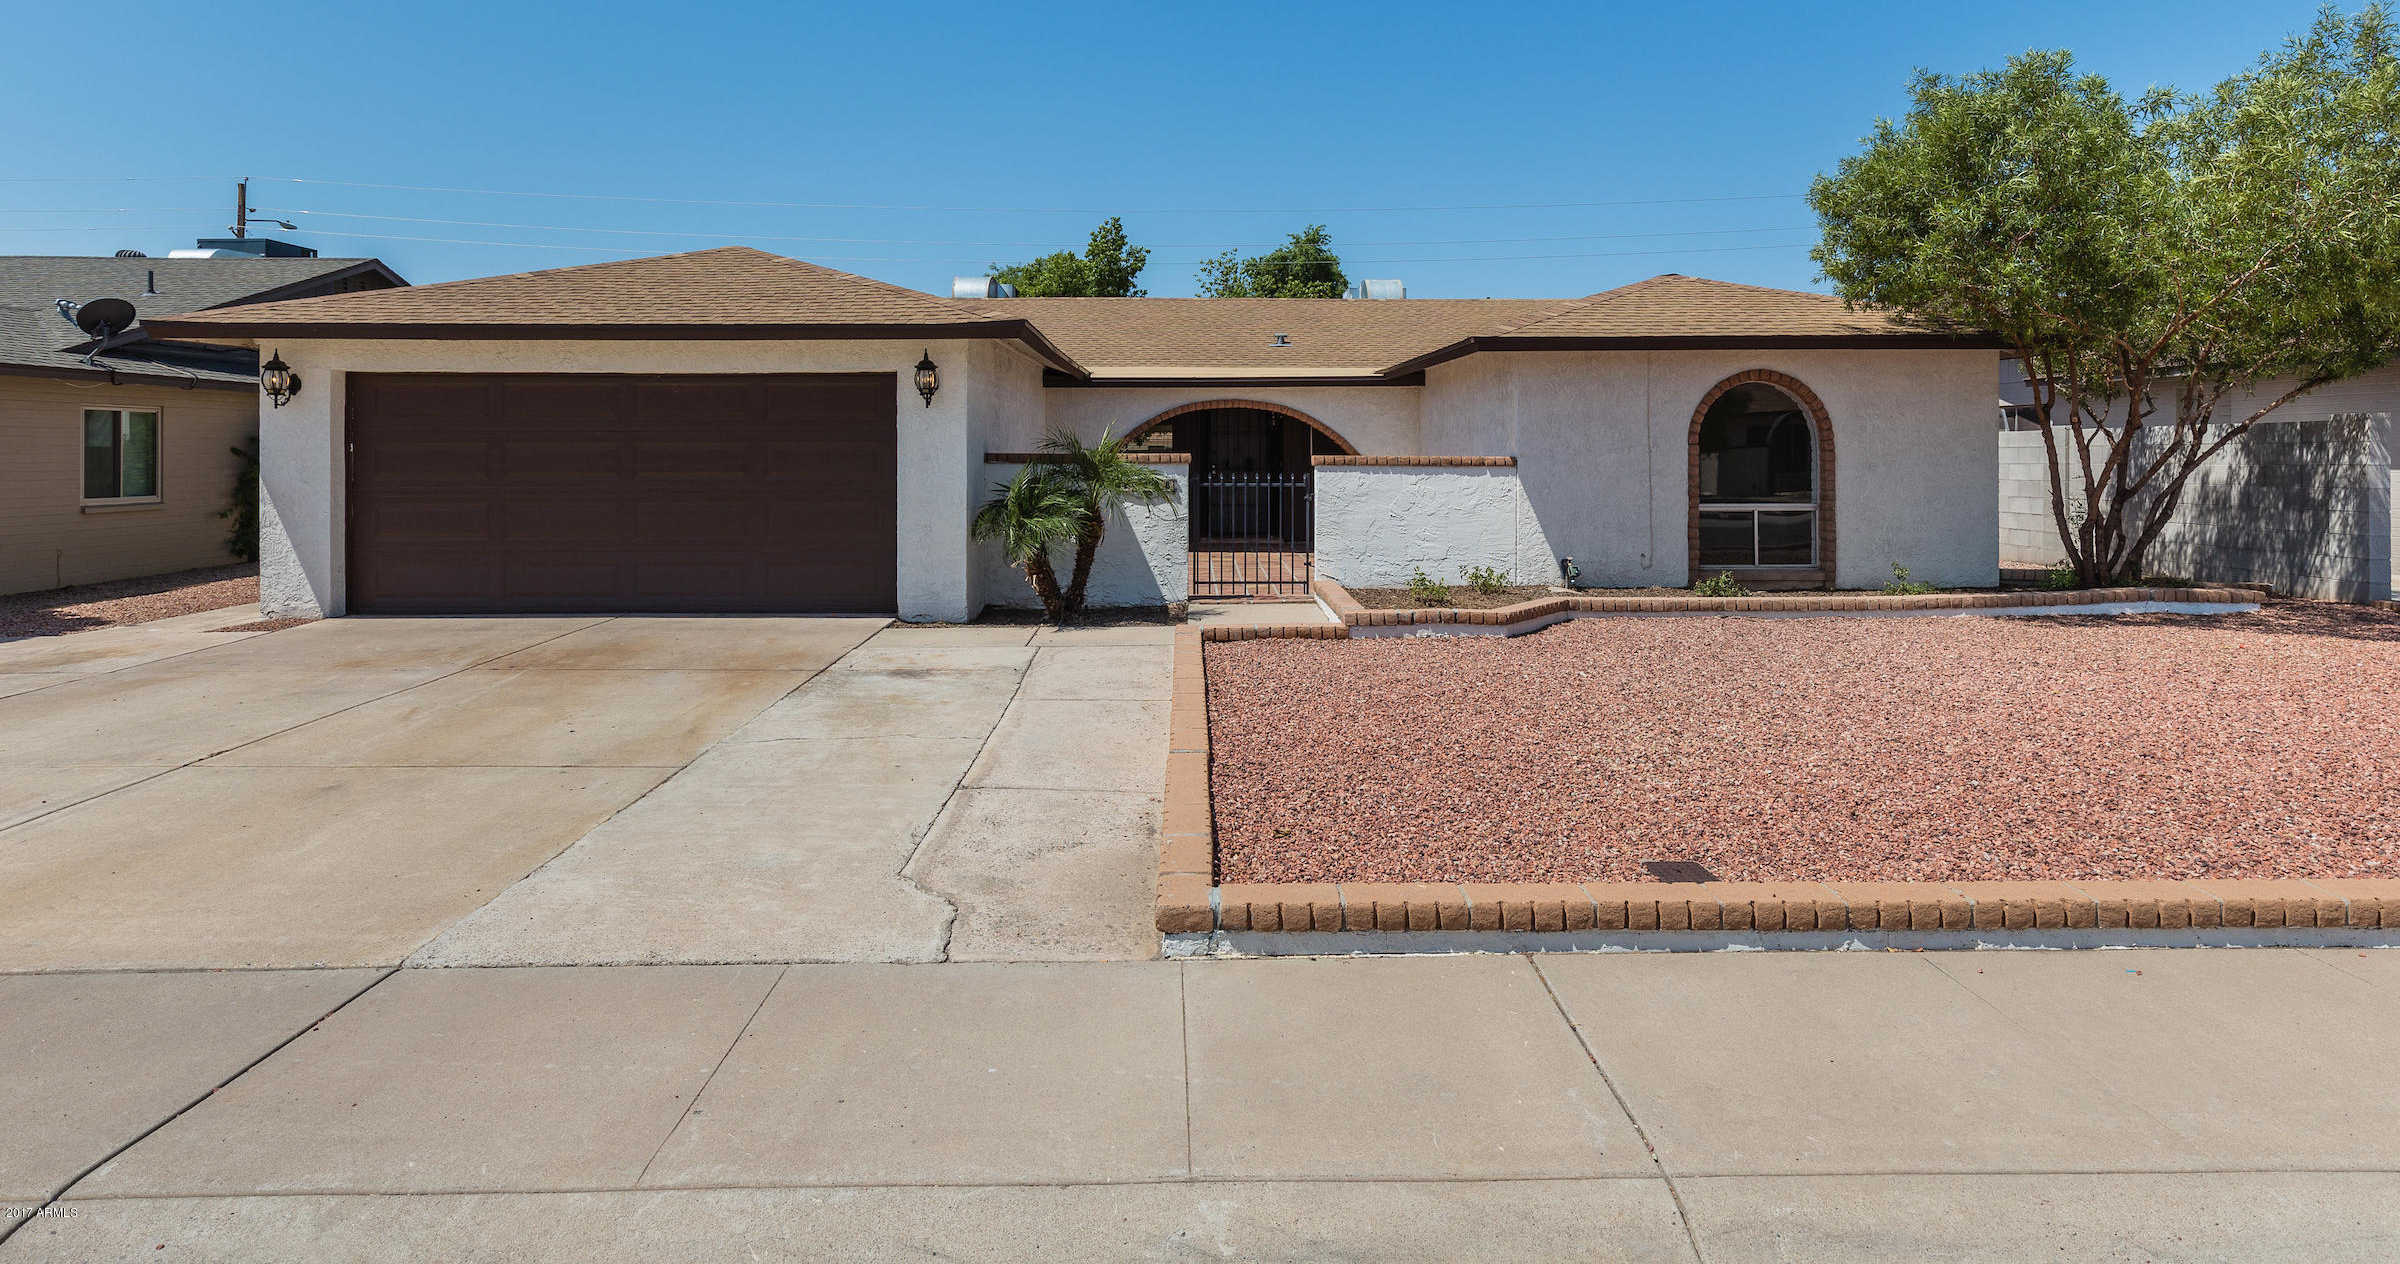 $249,500 - 4Br/2Ba - Home for Sale in Greenbrier, Glendale